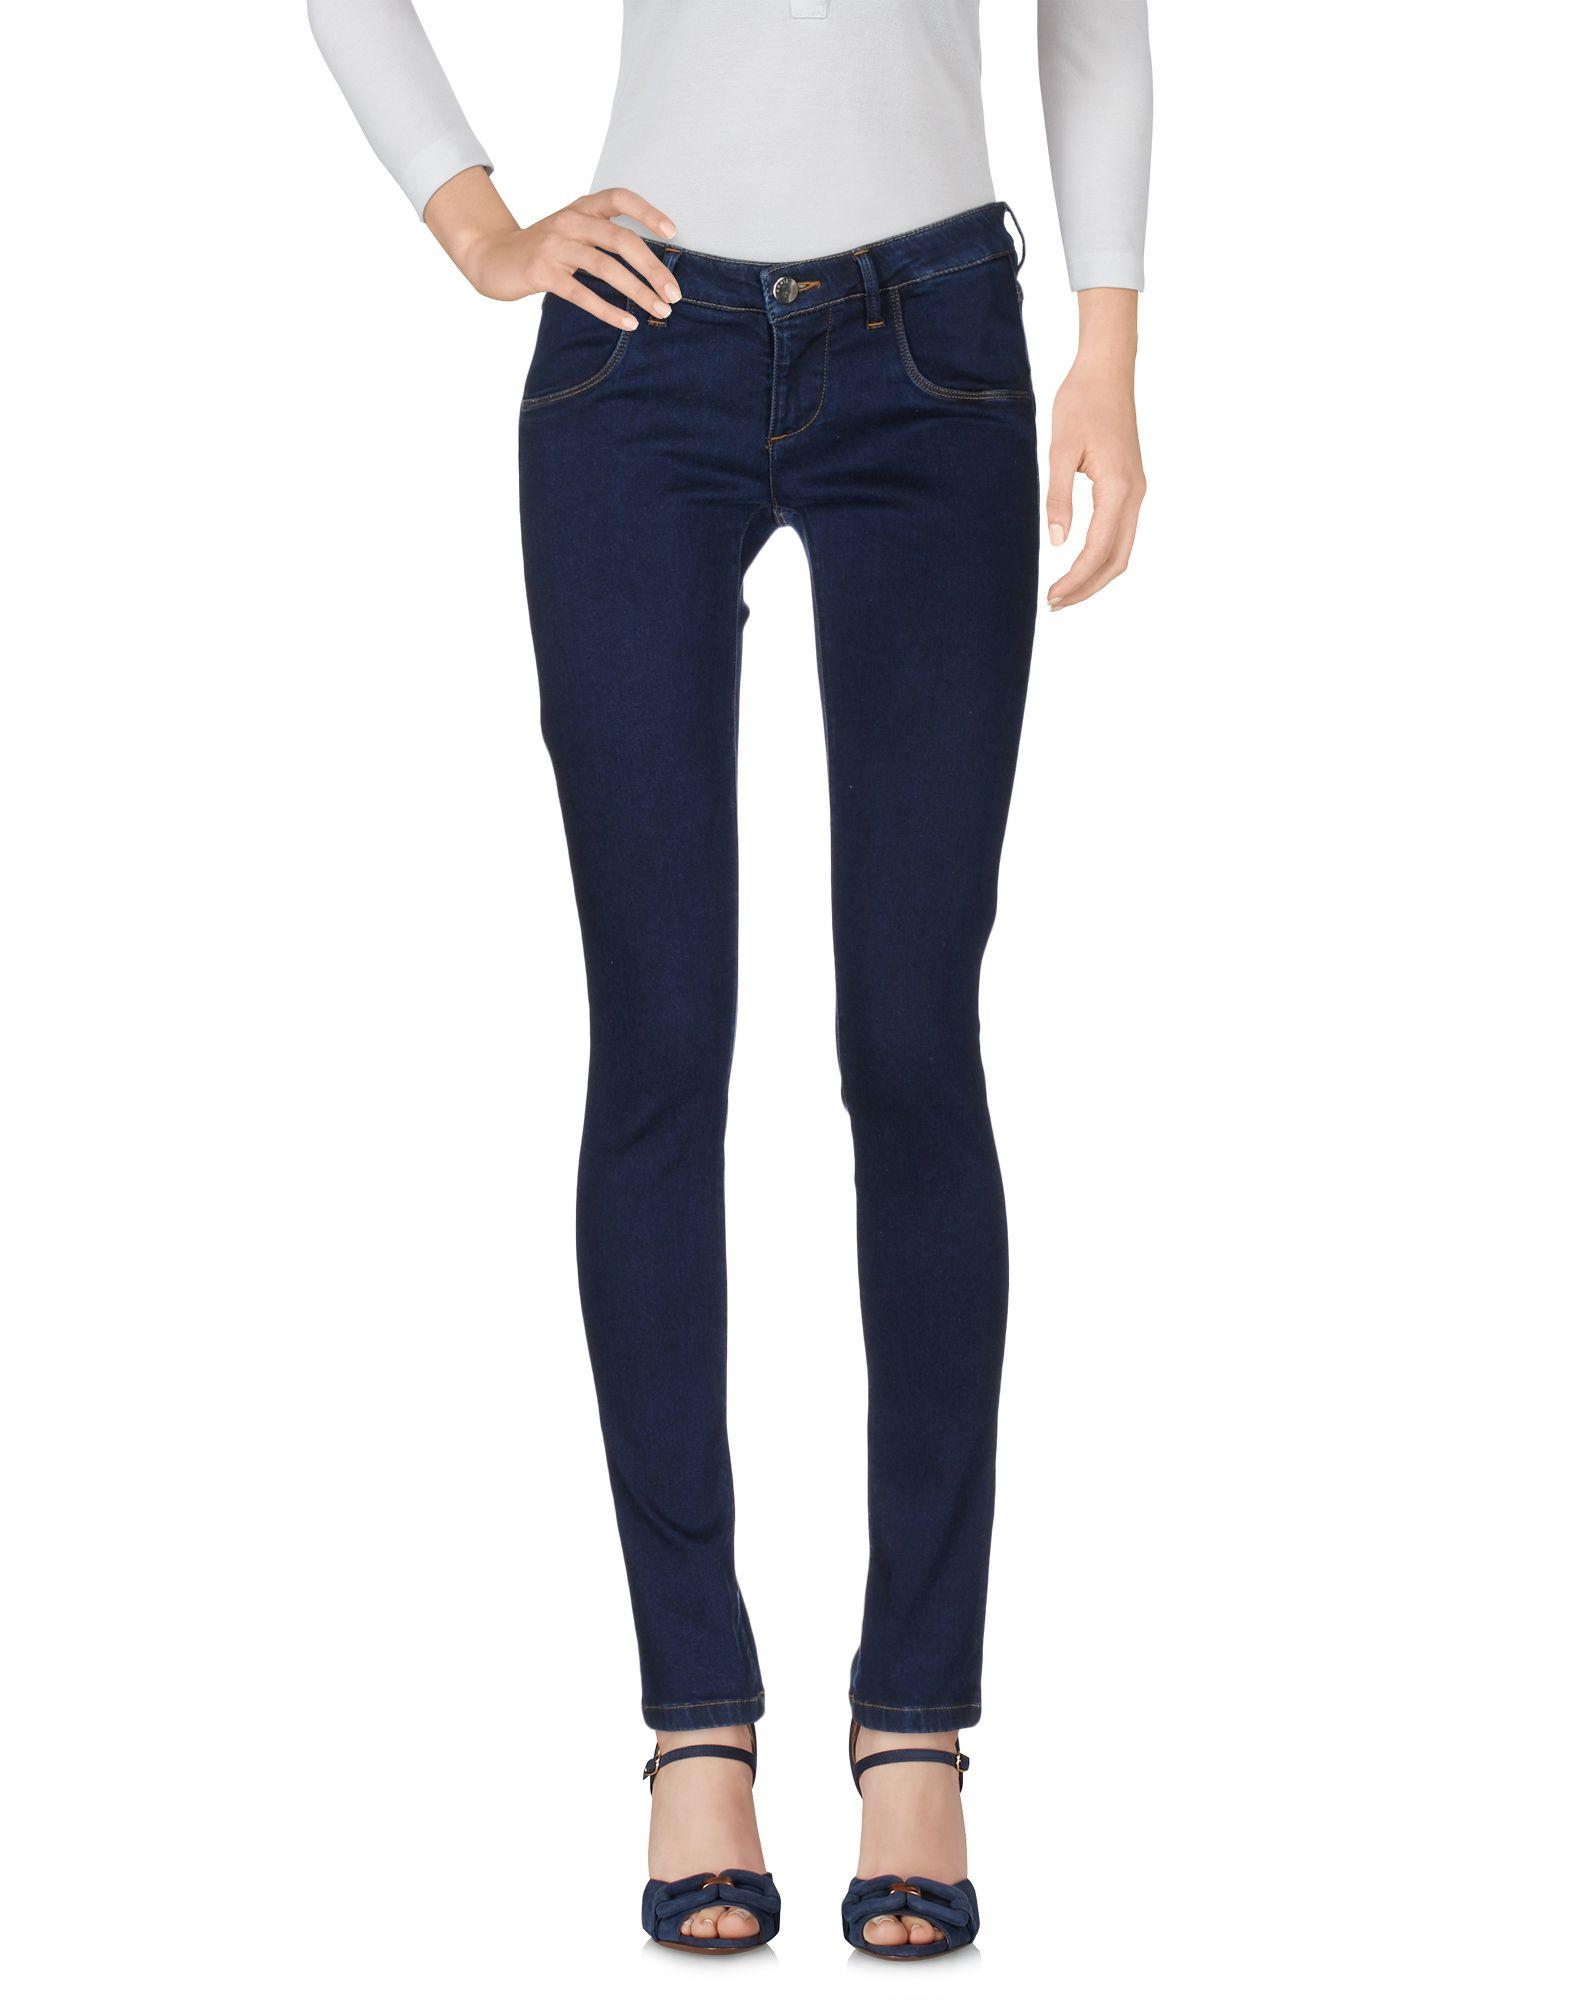 ANNIE P. Джинсовые брюки dismero джинсовые брюки